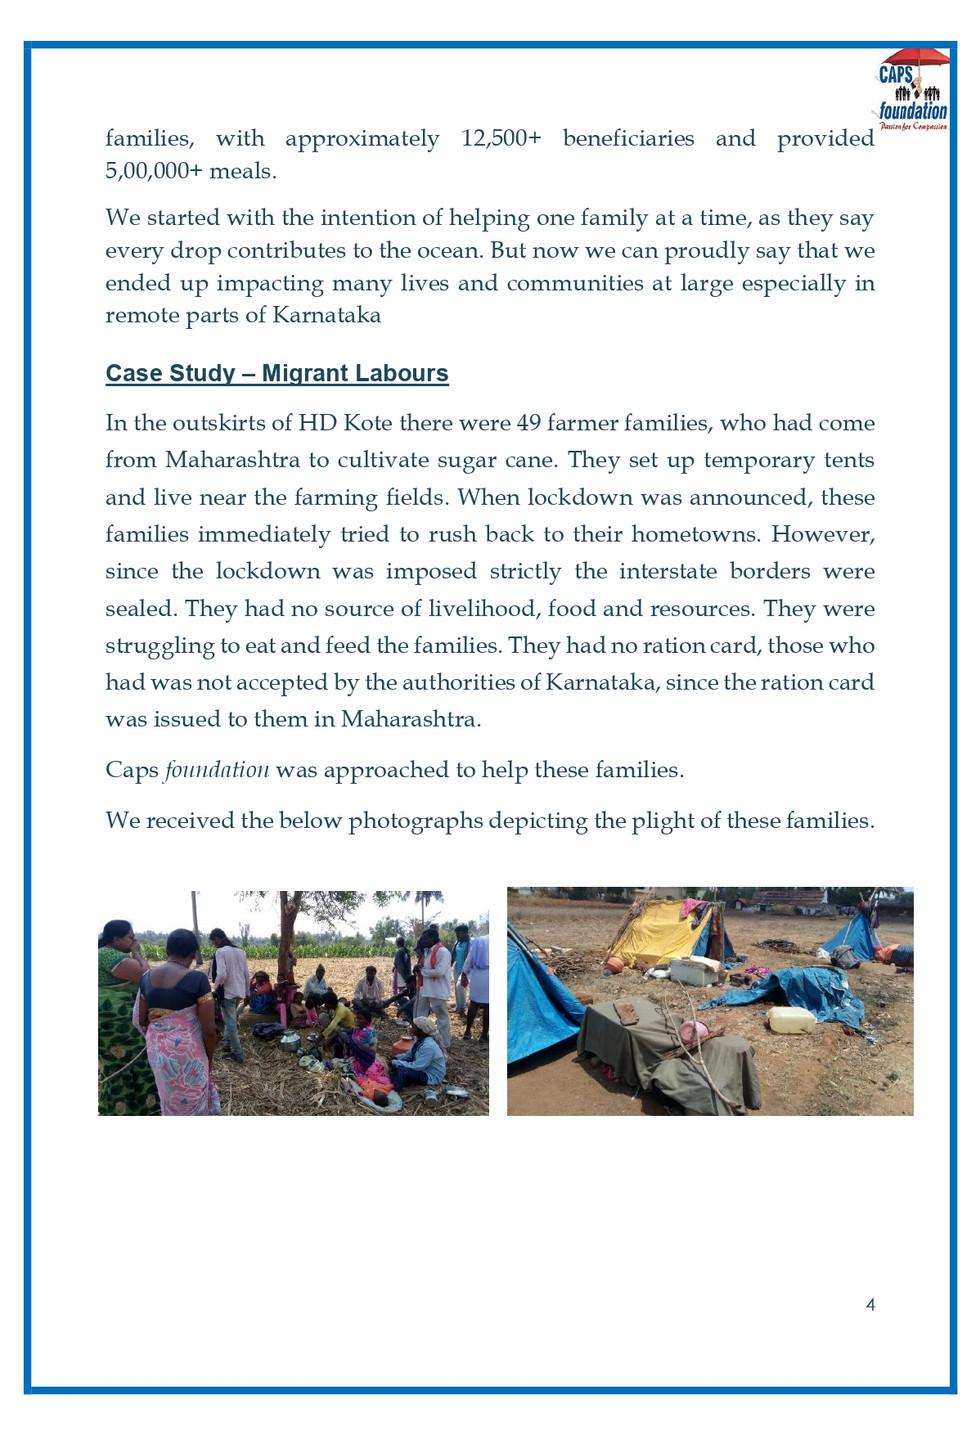 Cf Humanity - Brief Report - 25.1.21 (1)